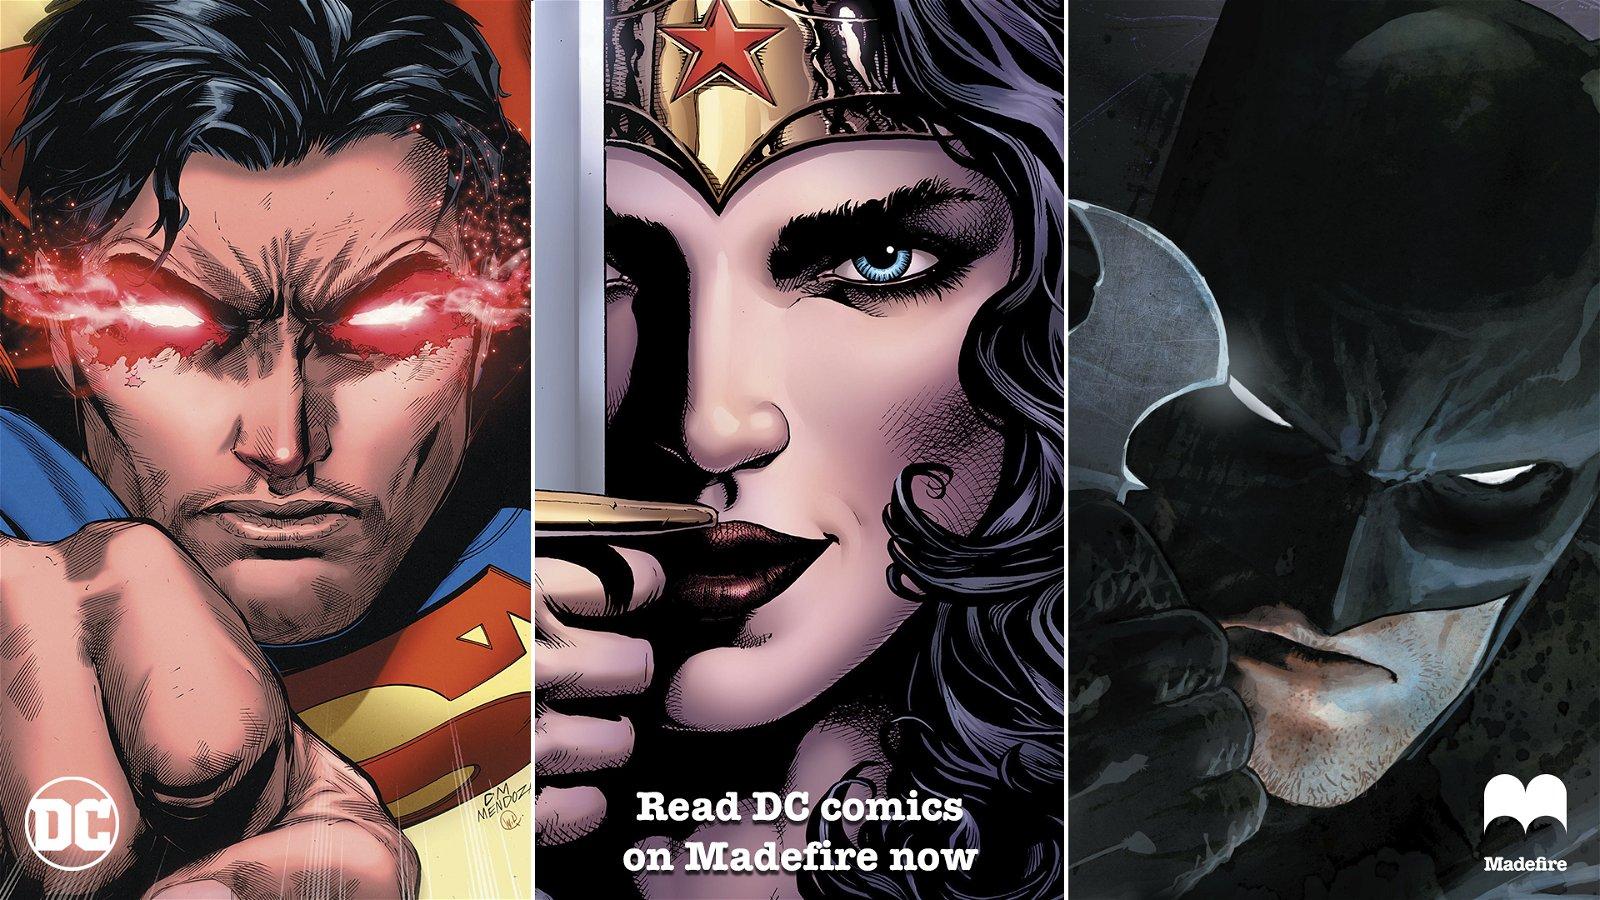 Madefire, Popular Digital Comic App Announces DC Partnership